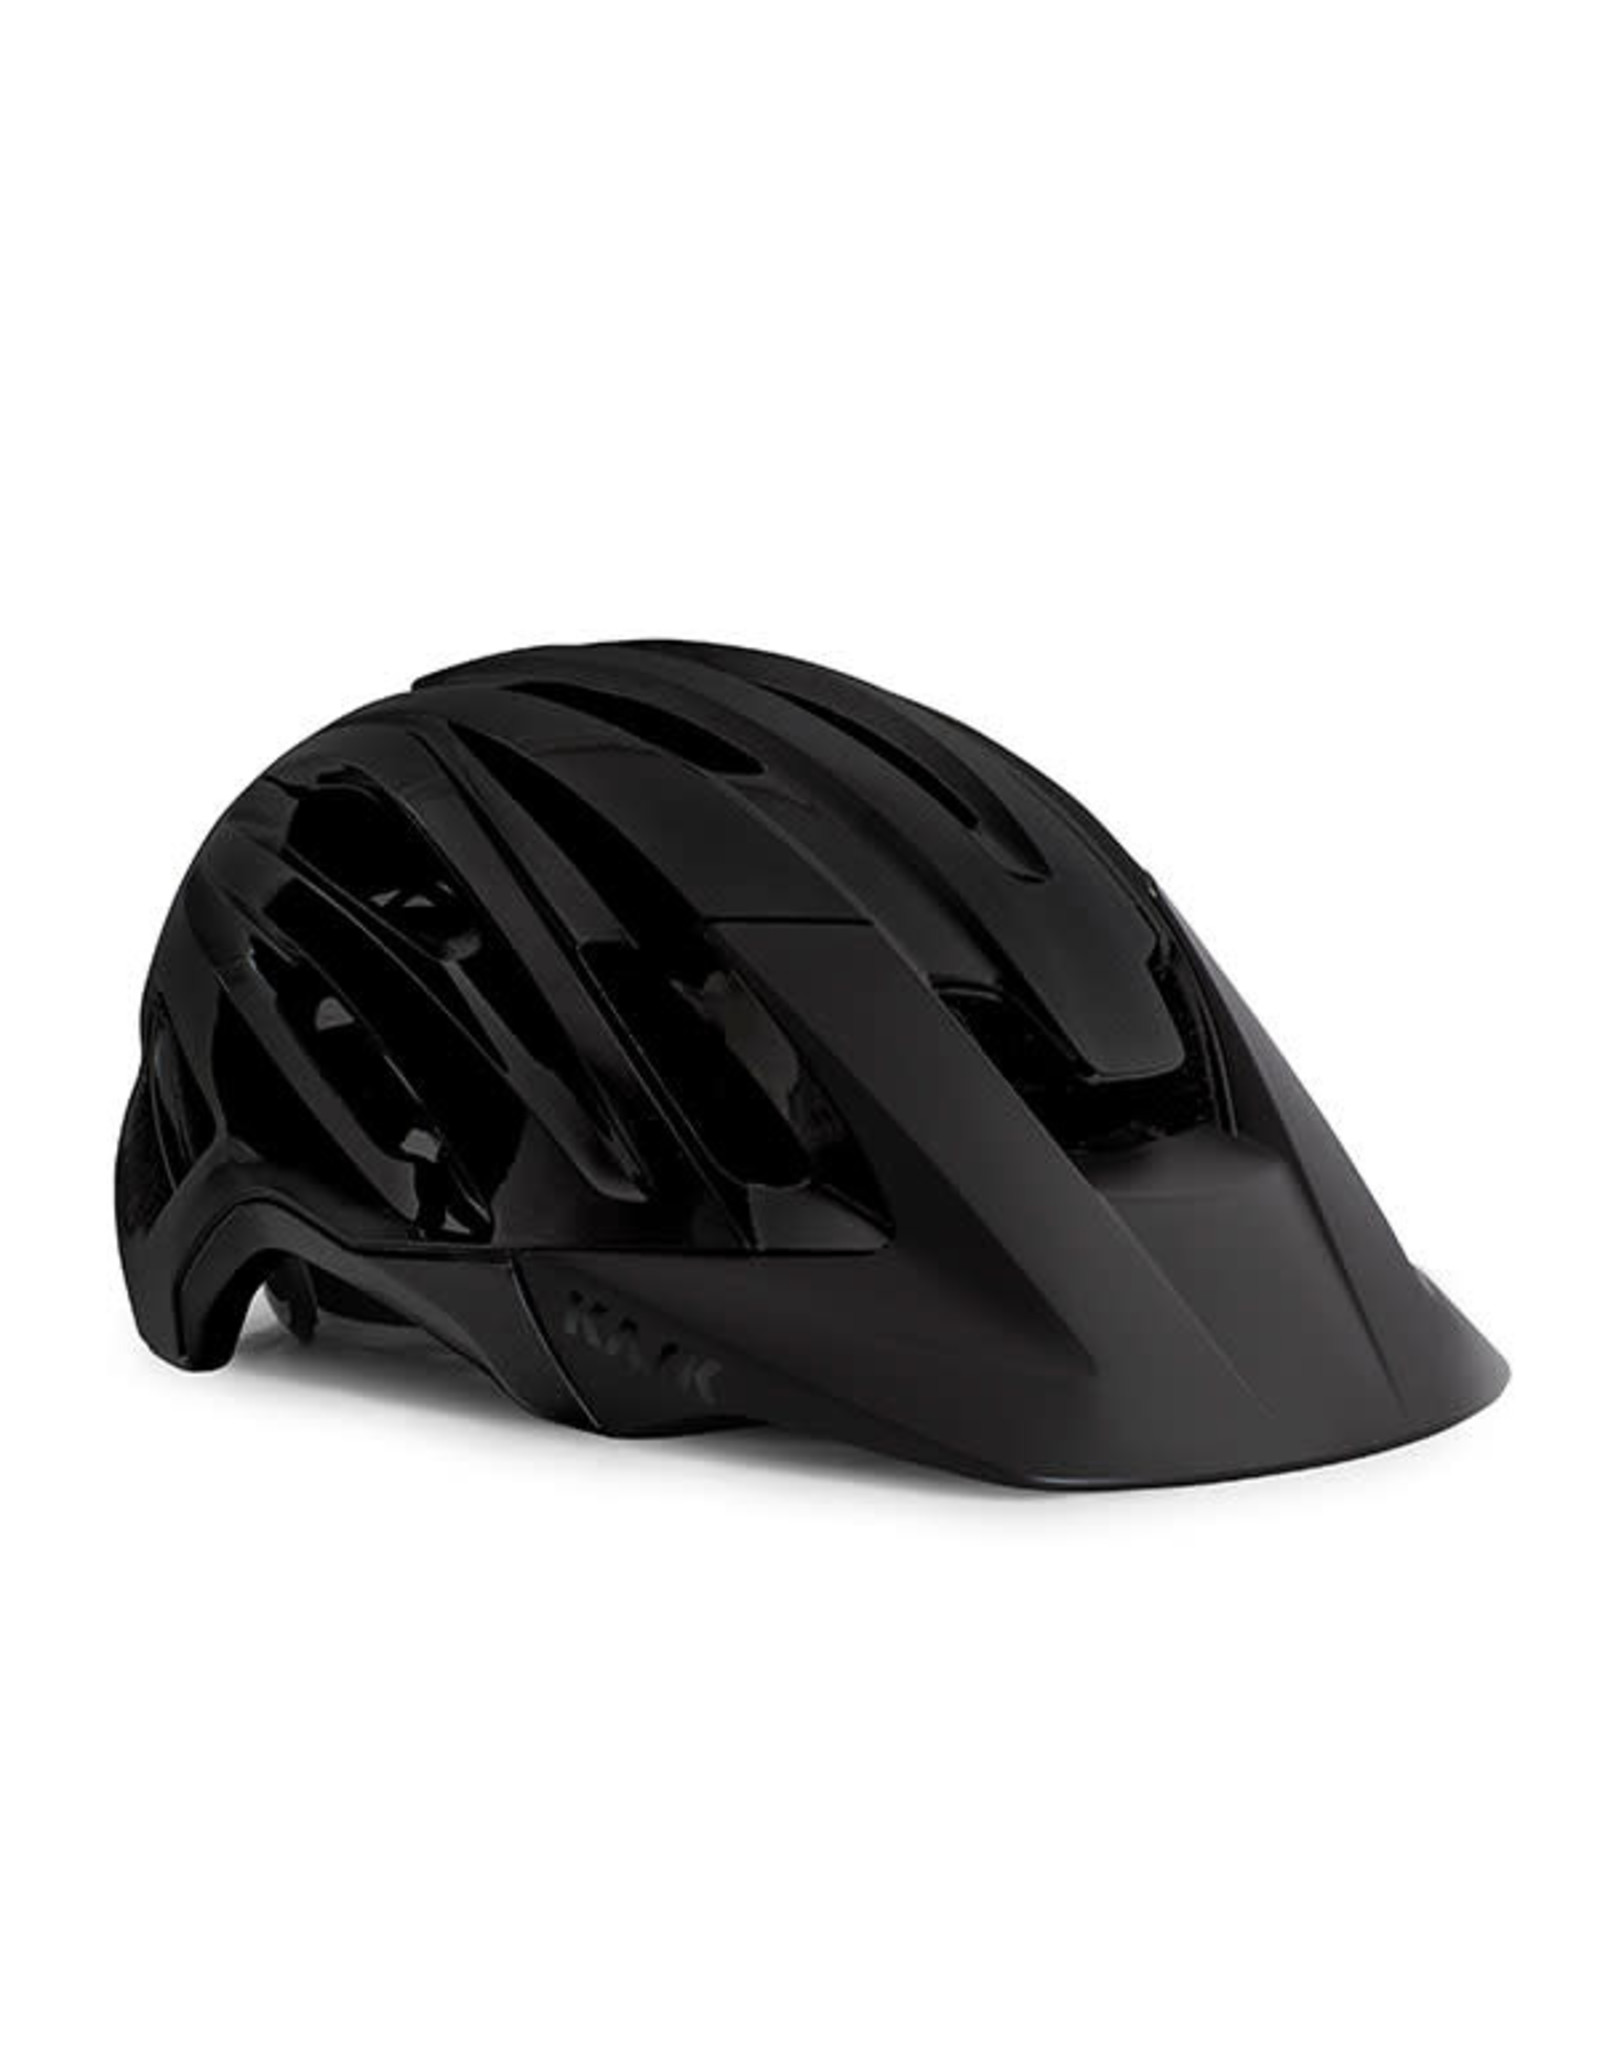 KASK Caipi Off-Road Helmet